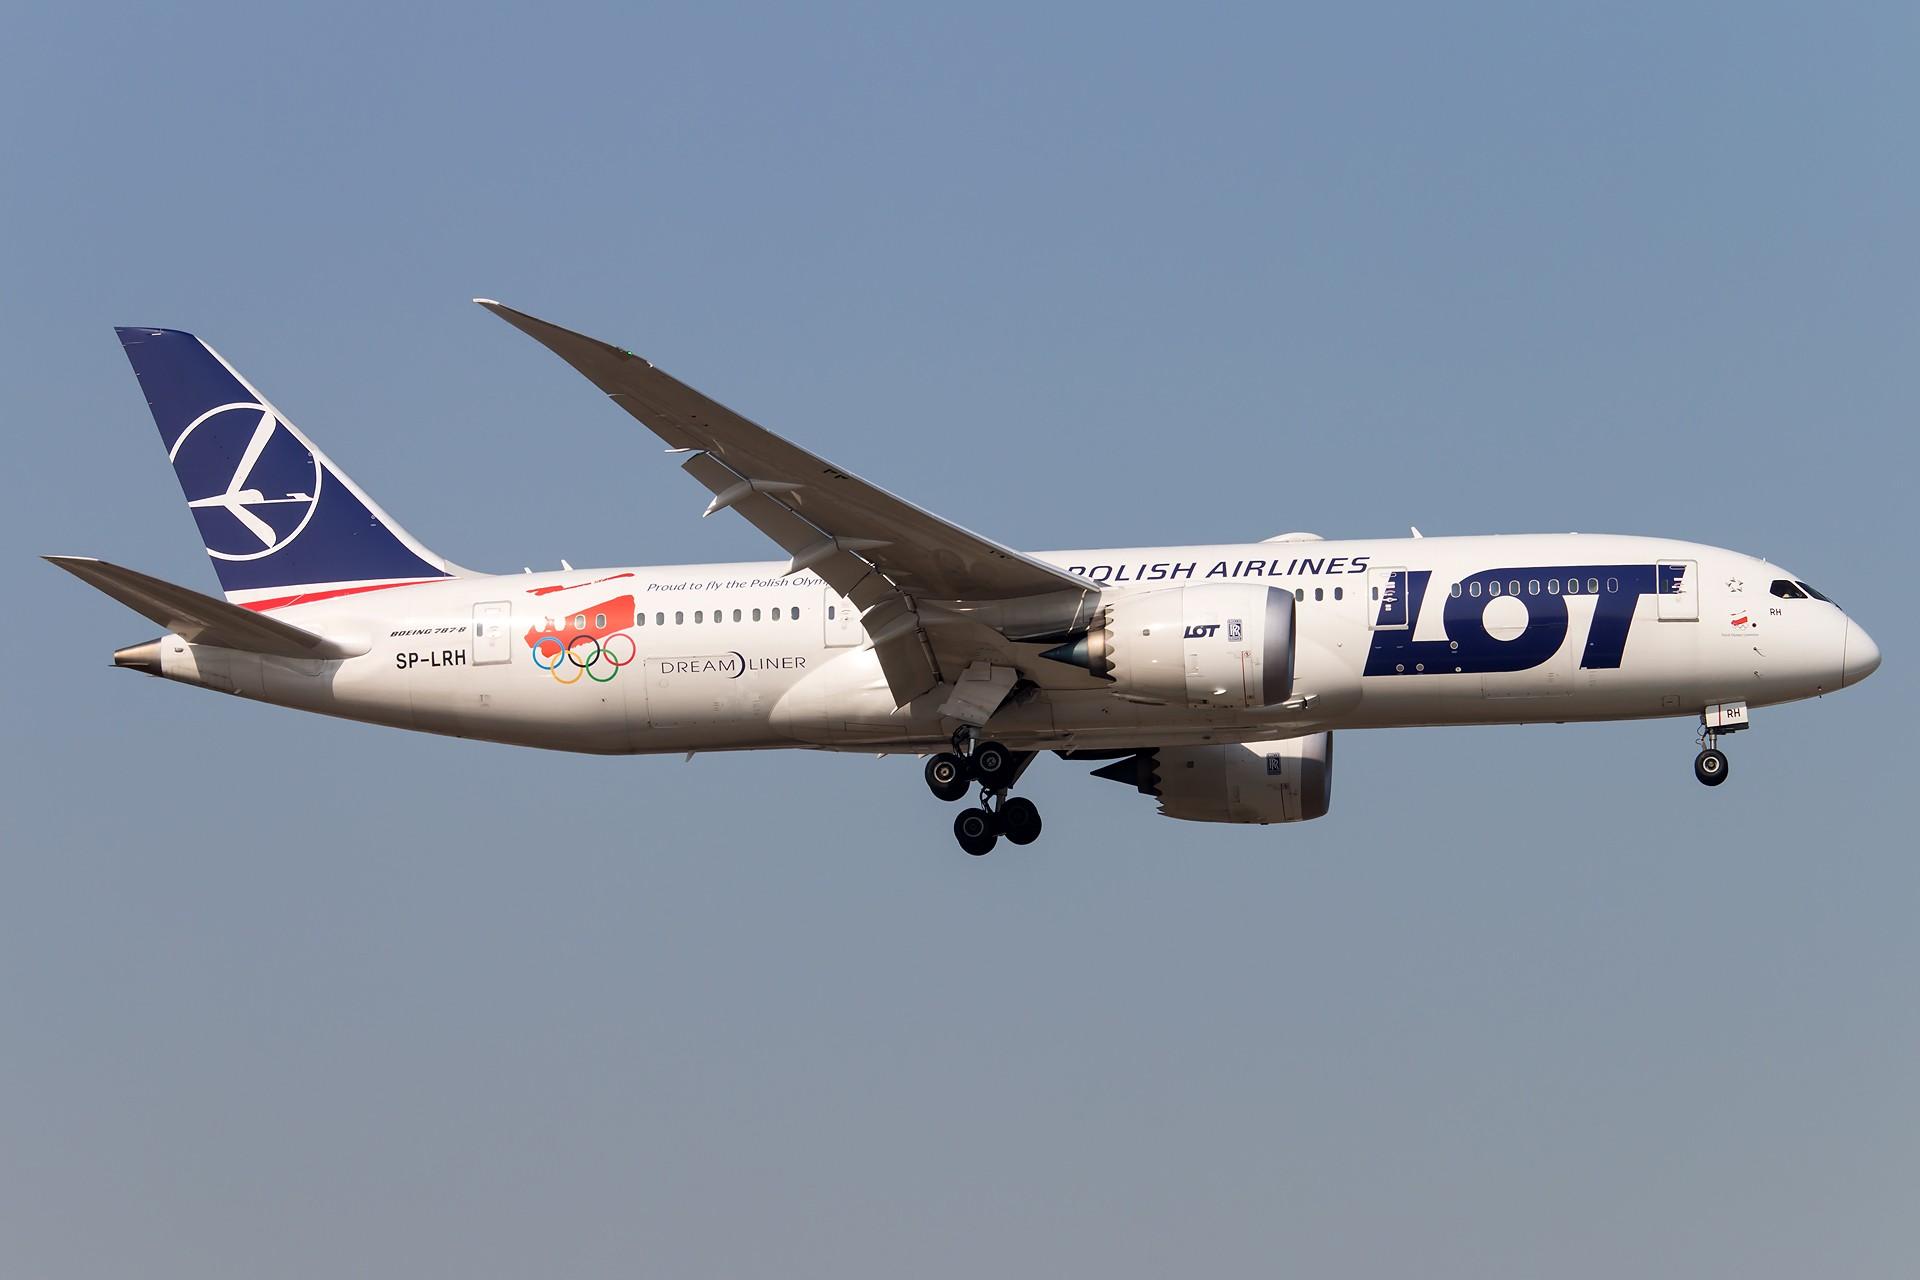 Re:[原创]阿联酋EXPO2020 & 波兰冬奥 BOEING 787-8 DREAMLINER SP-LRH 中国北京首都国际机场